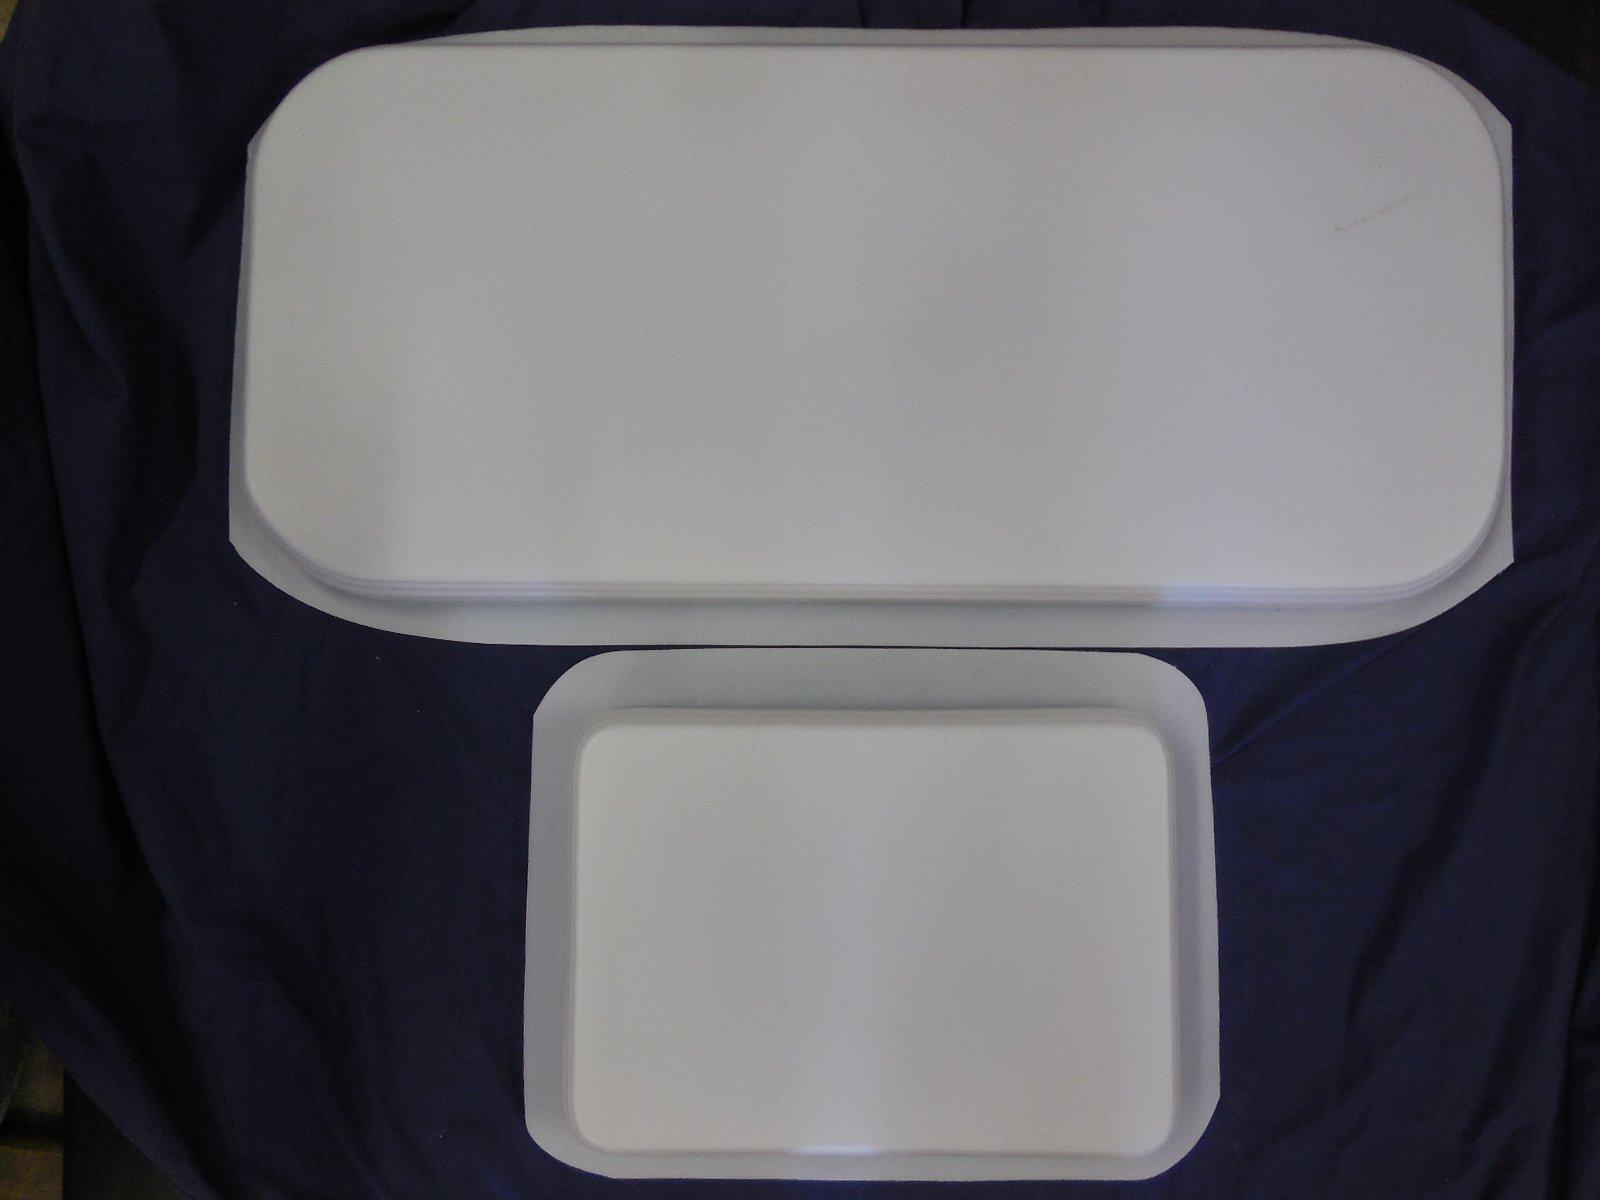 Simple Design Bench Concrete or Plaster Mold Set 9001